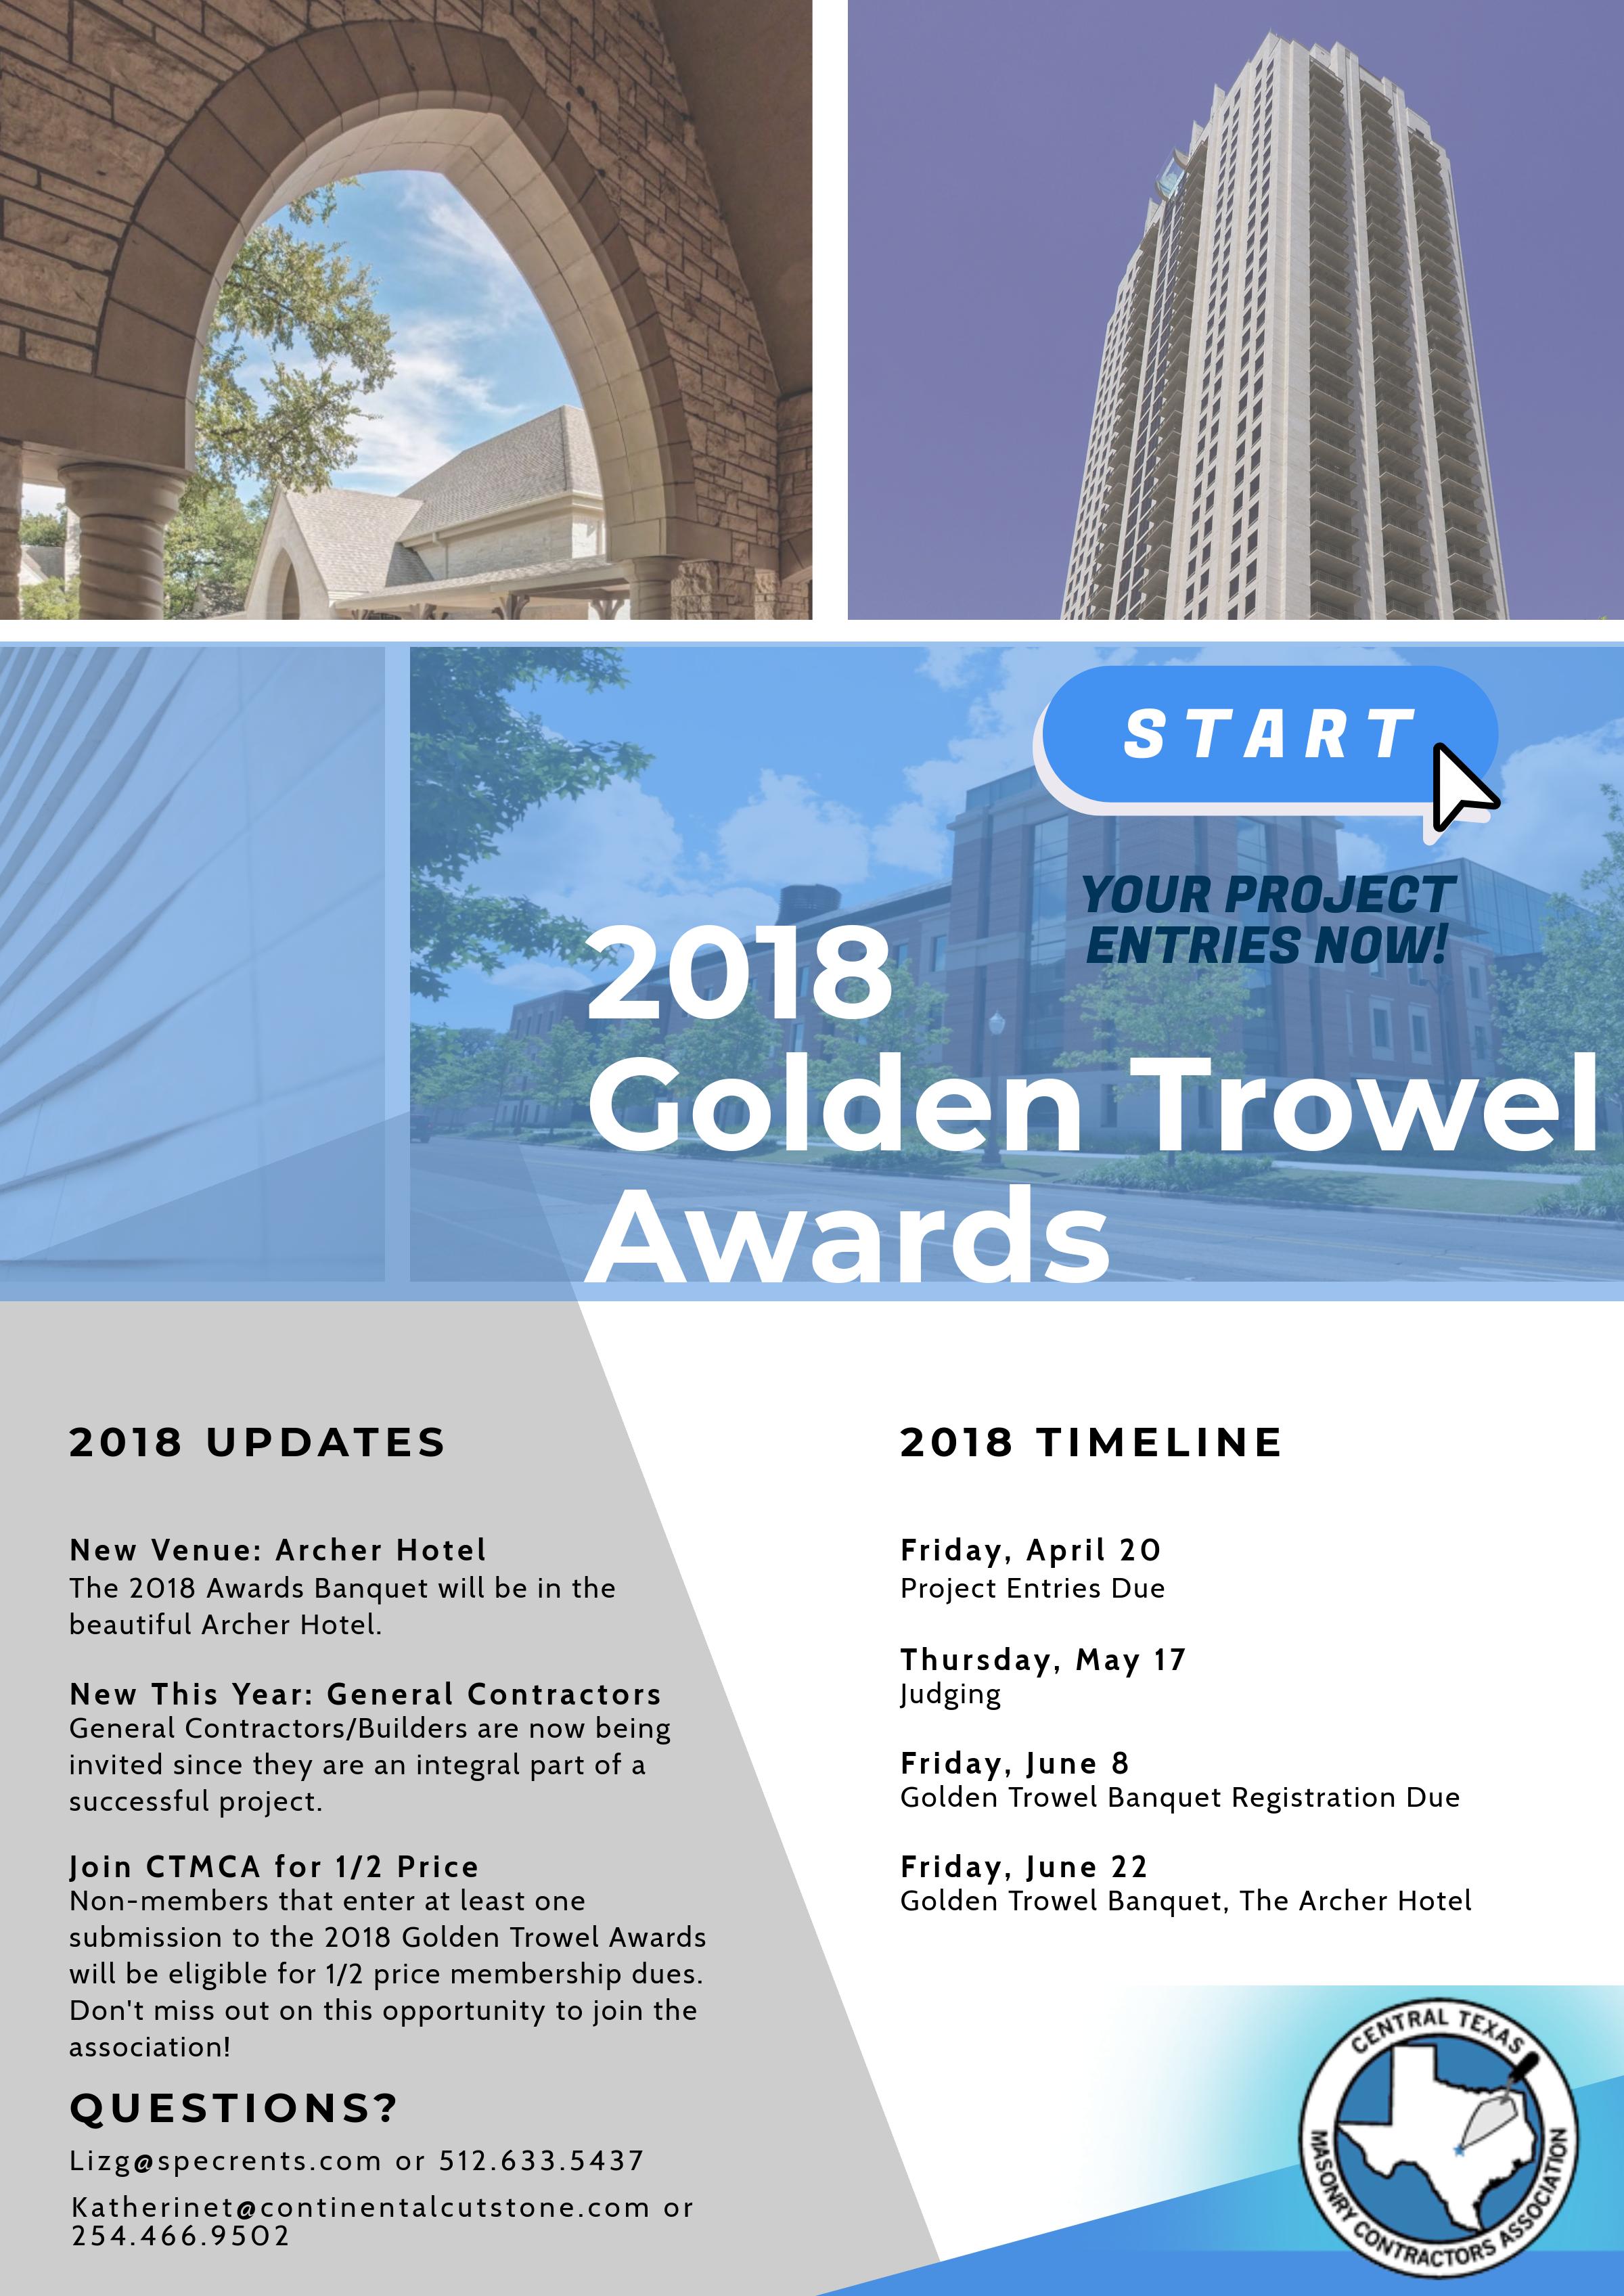 Golden Trowel Flyer_March 2018 with Half Price Membership_Rev2.png